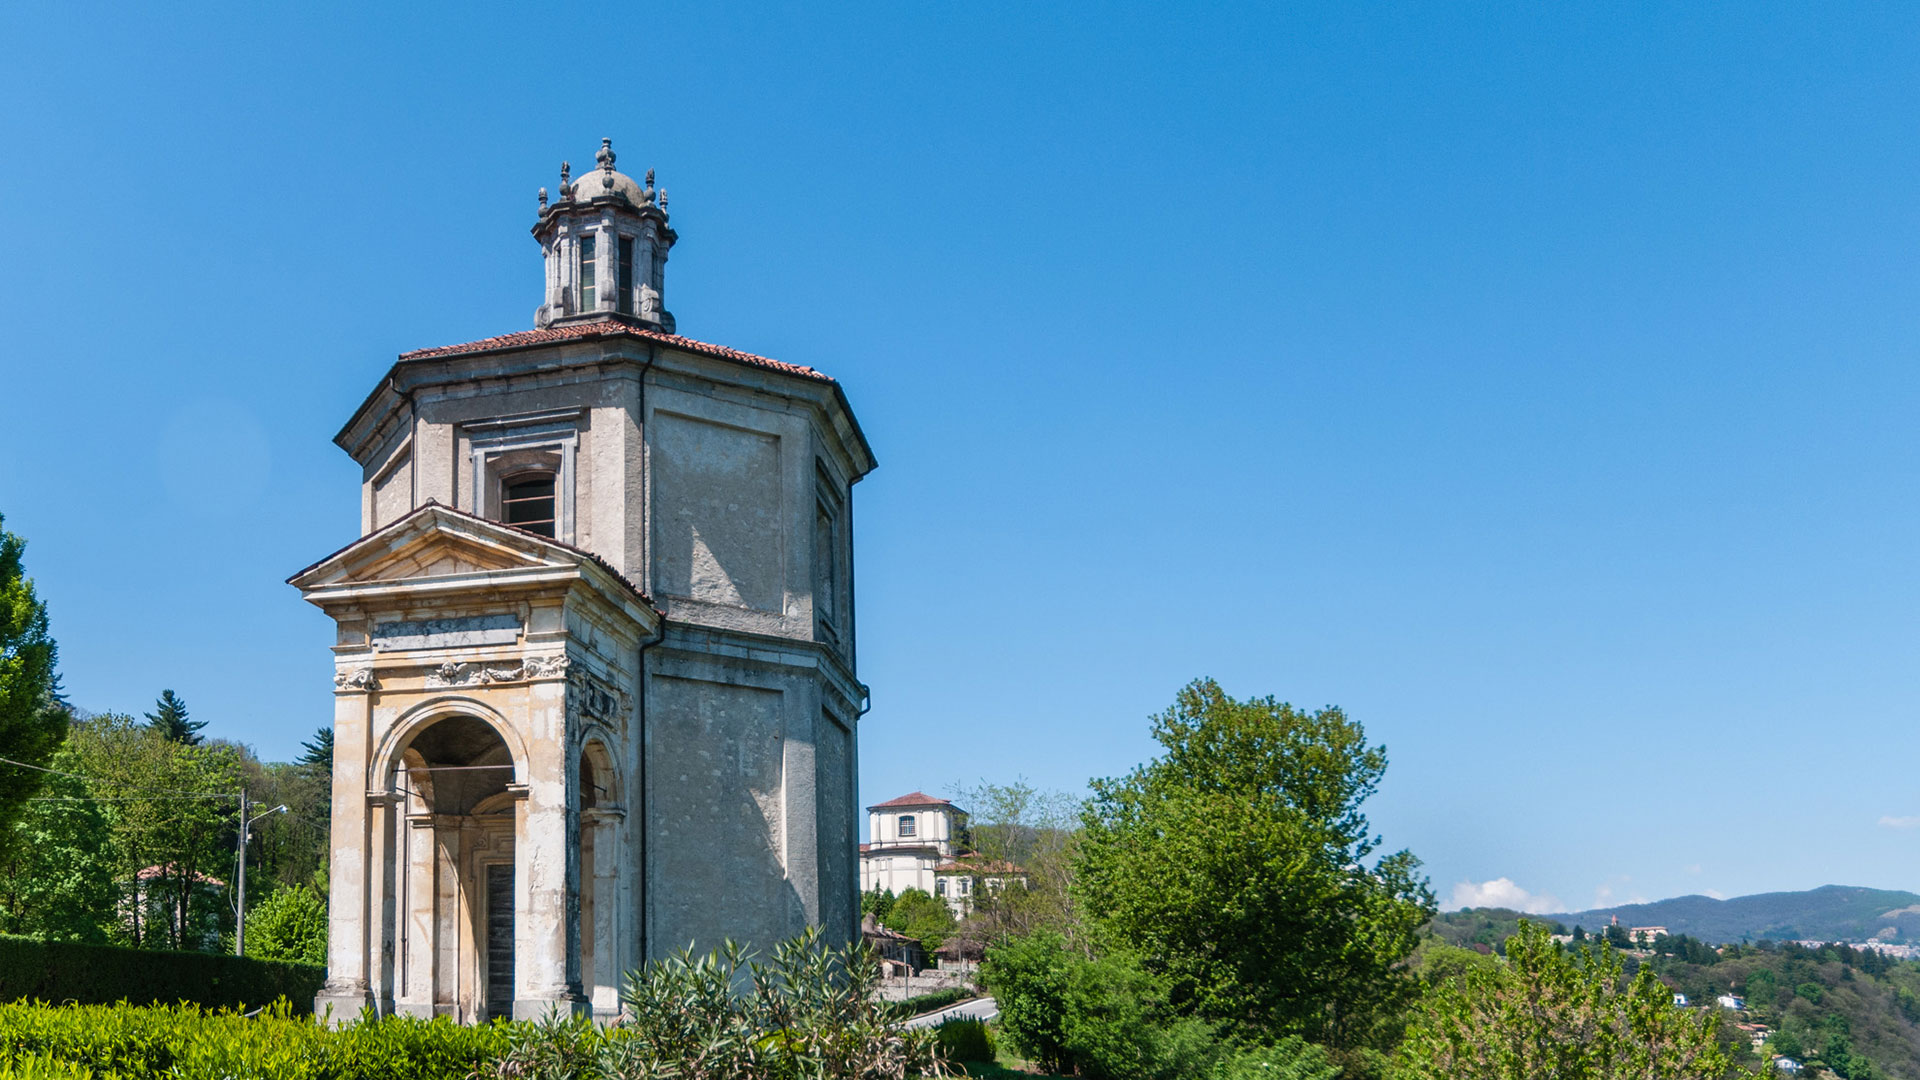 Cappella del Sacro Monte